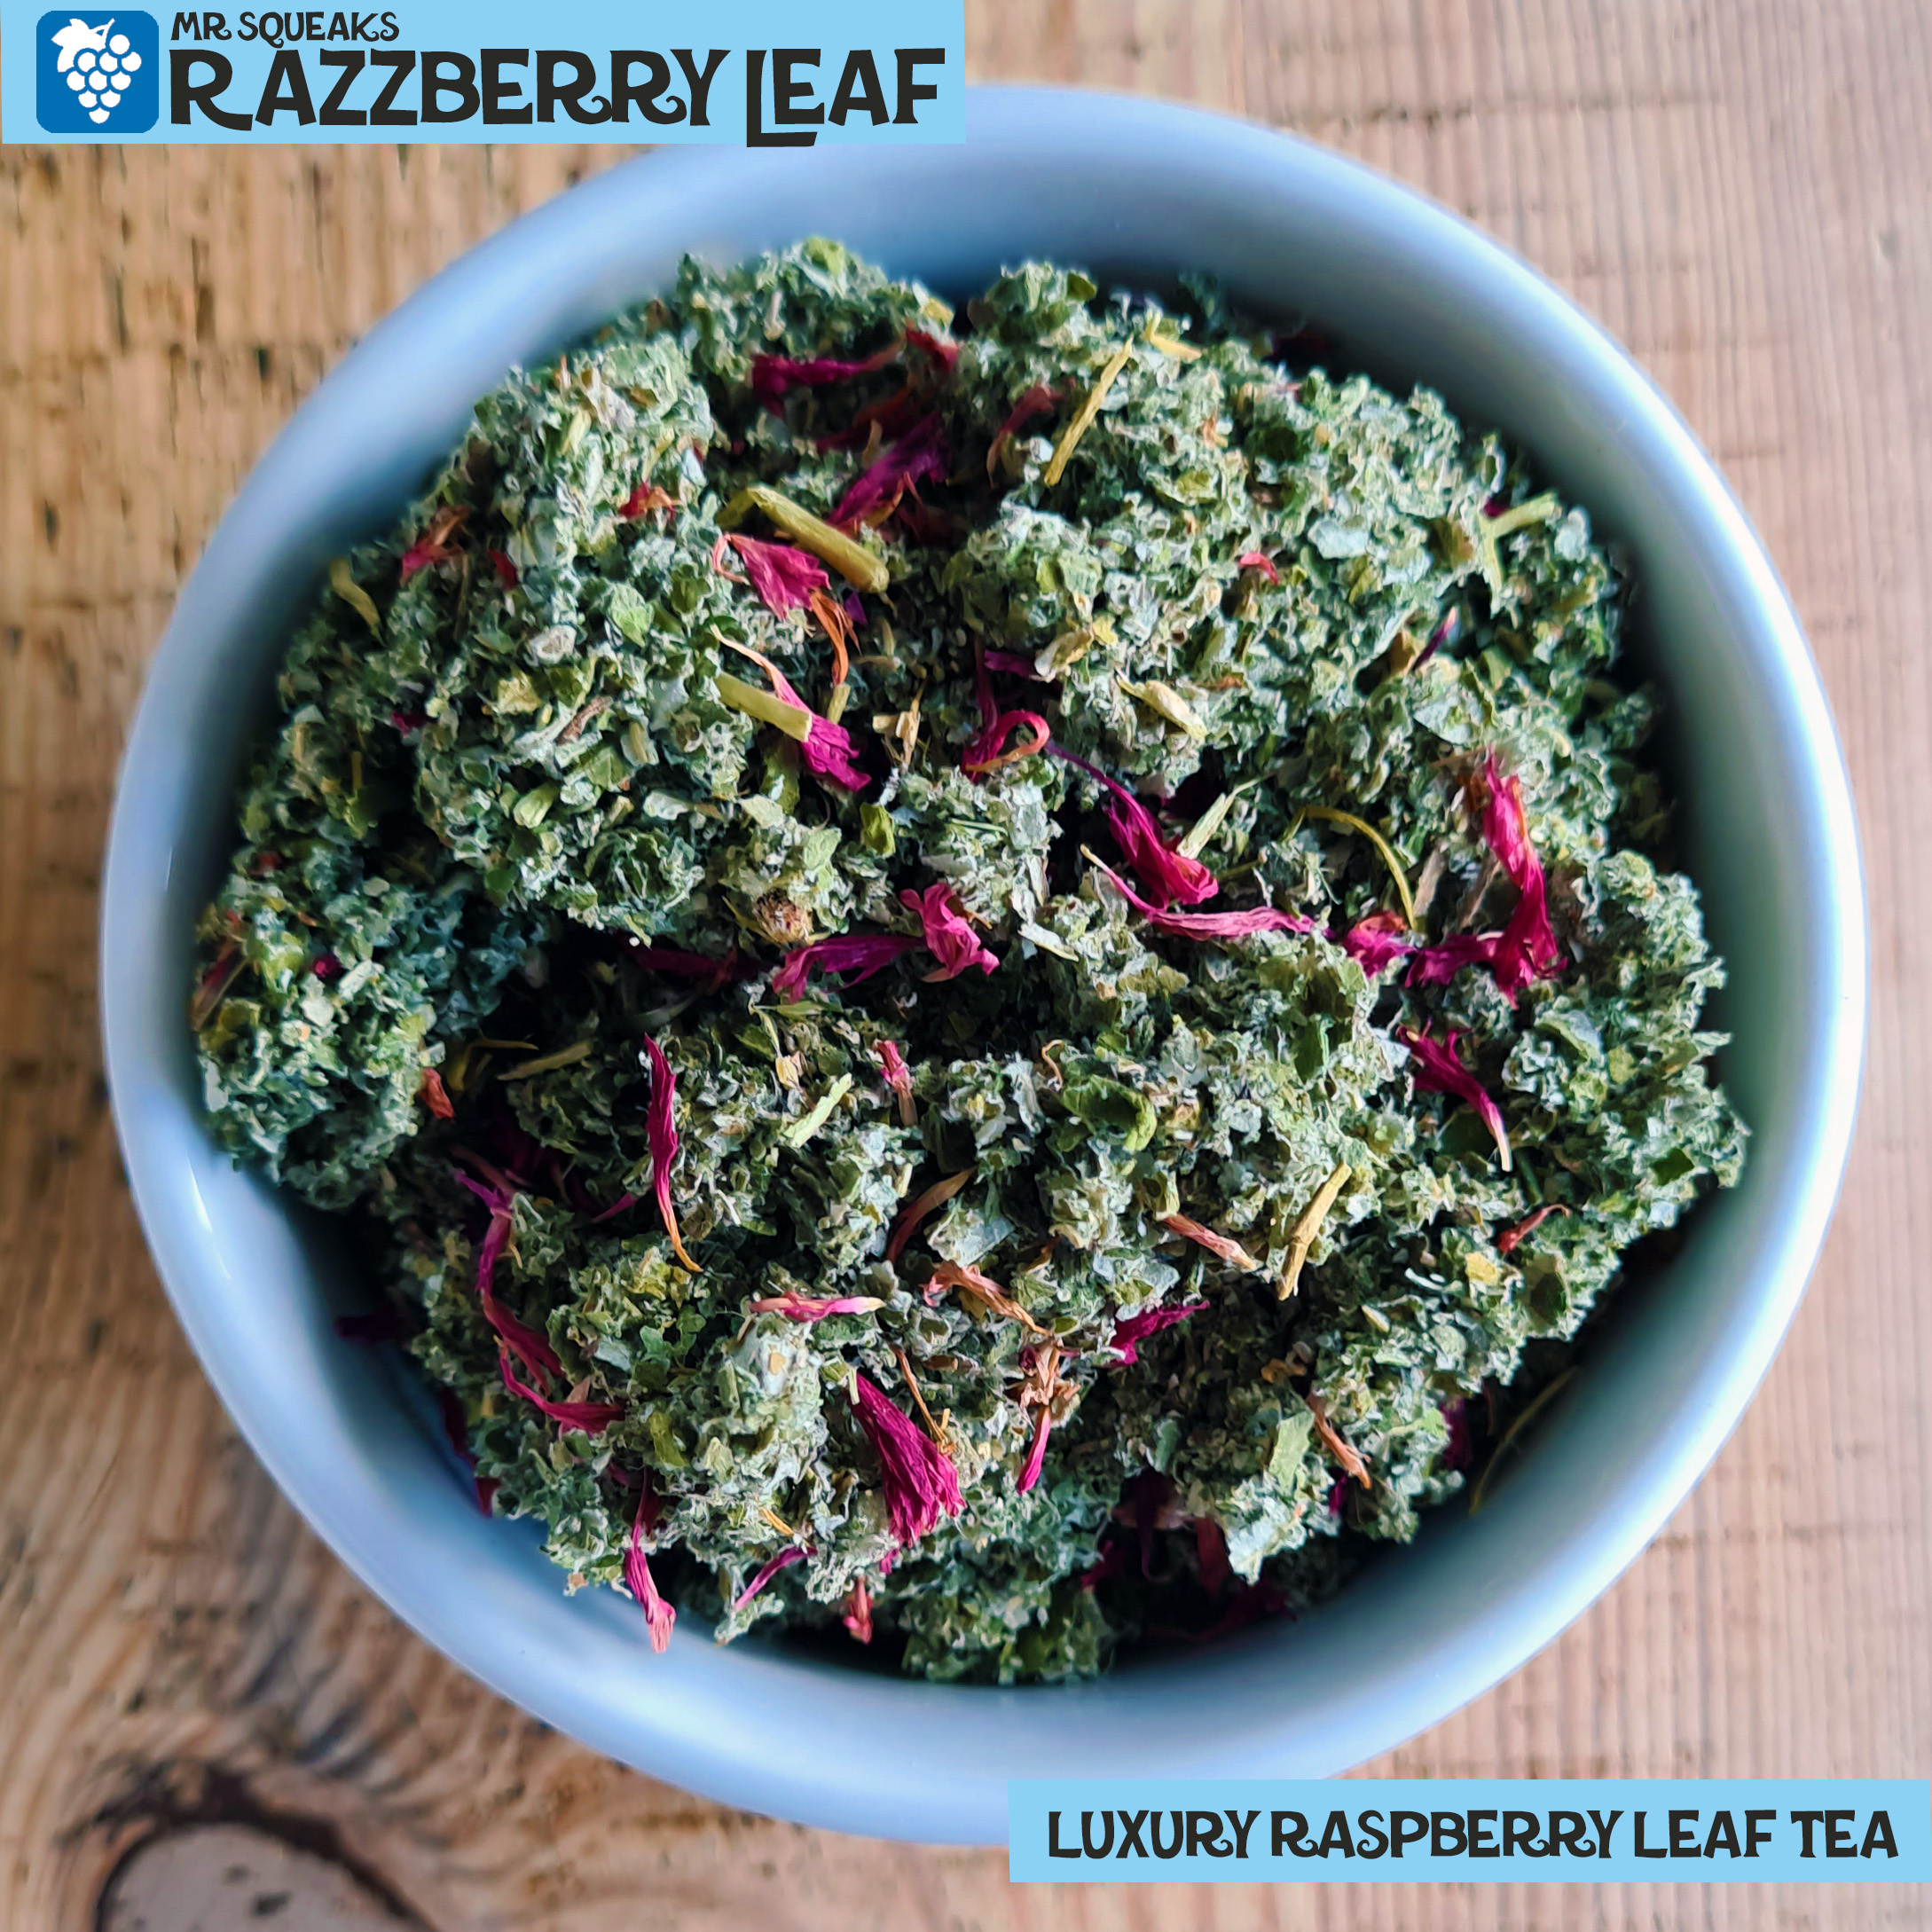 Razzberry Leaf